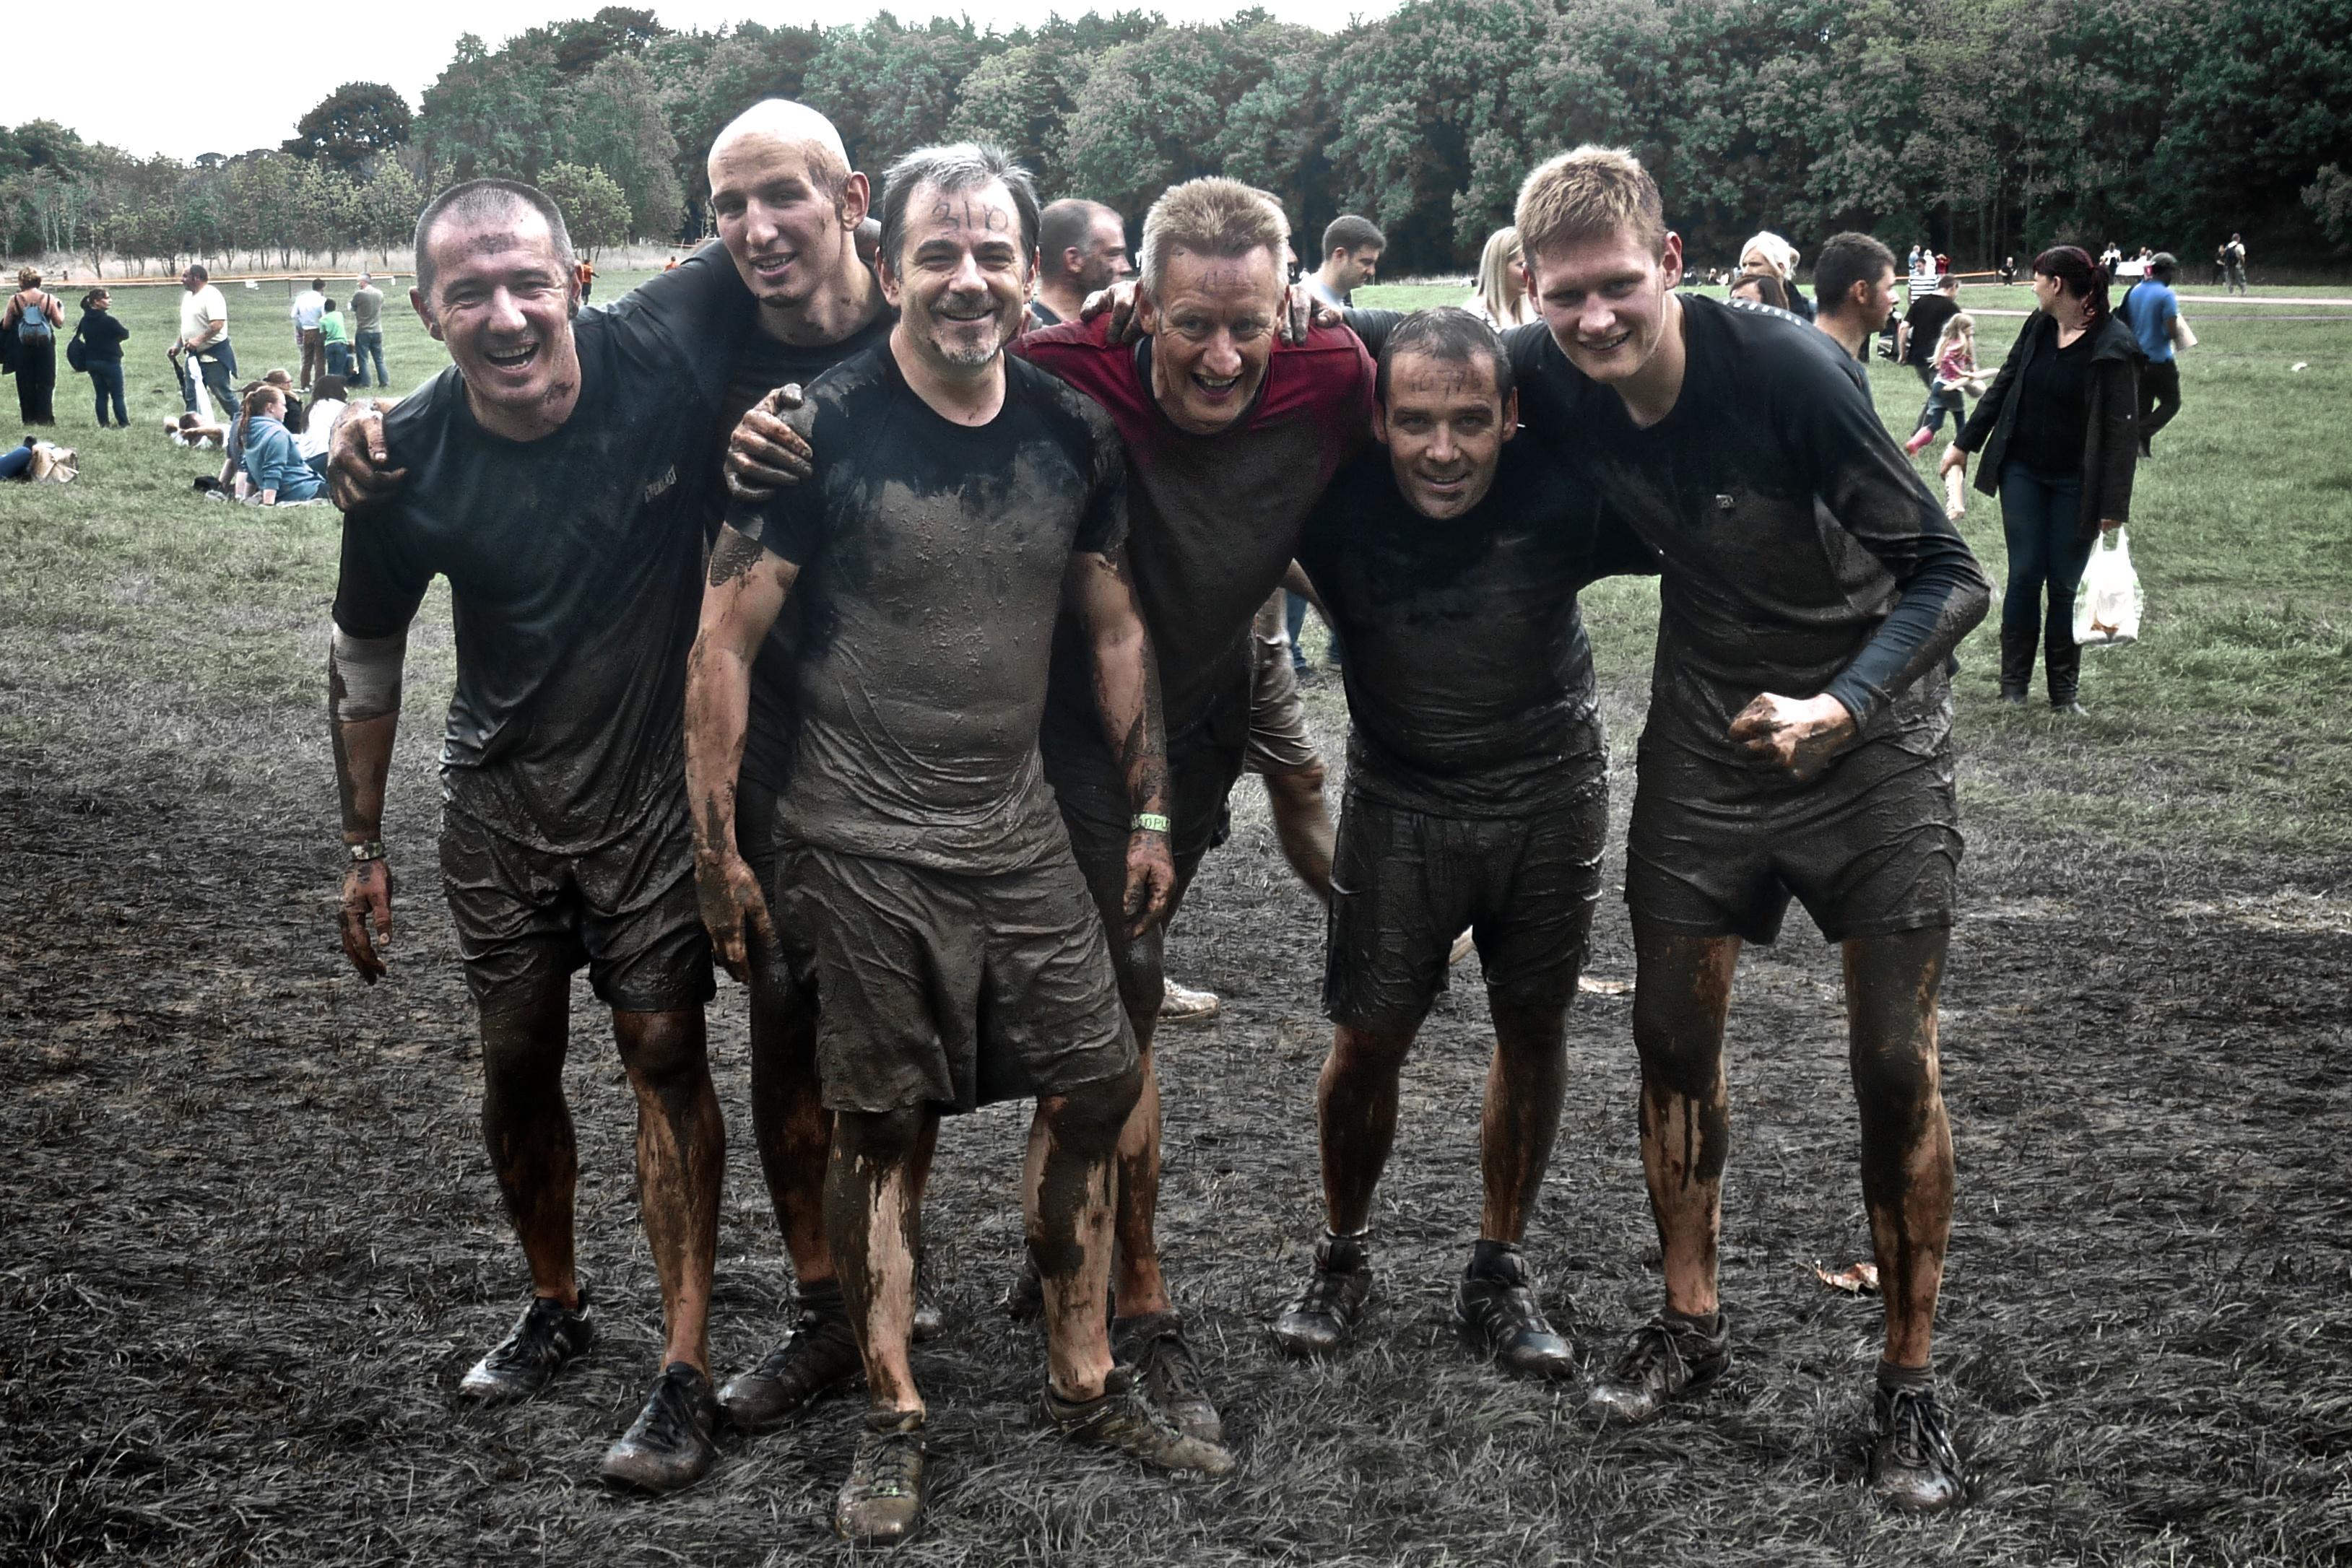 Exolta join MBN for the Edinburgh 2013 Tough Mudder